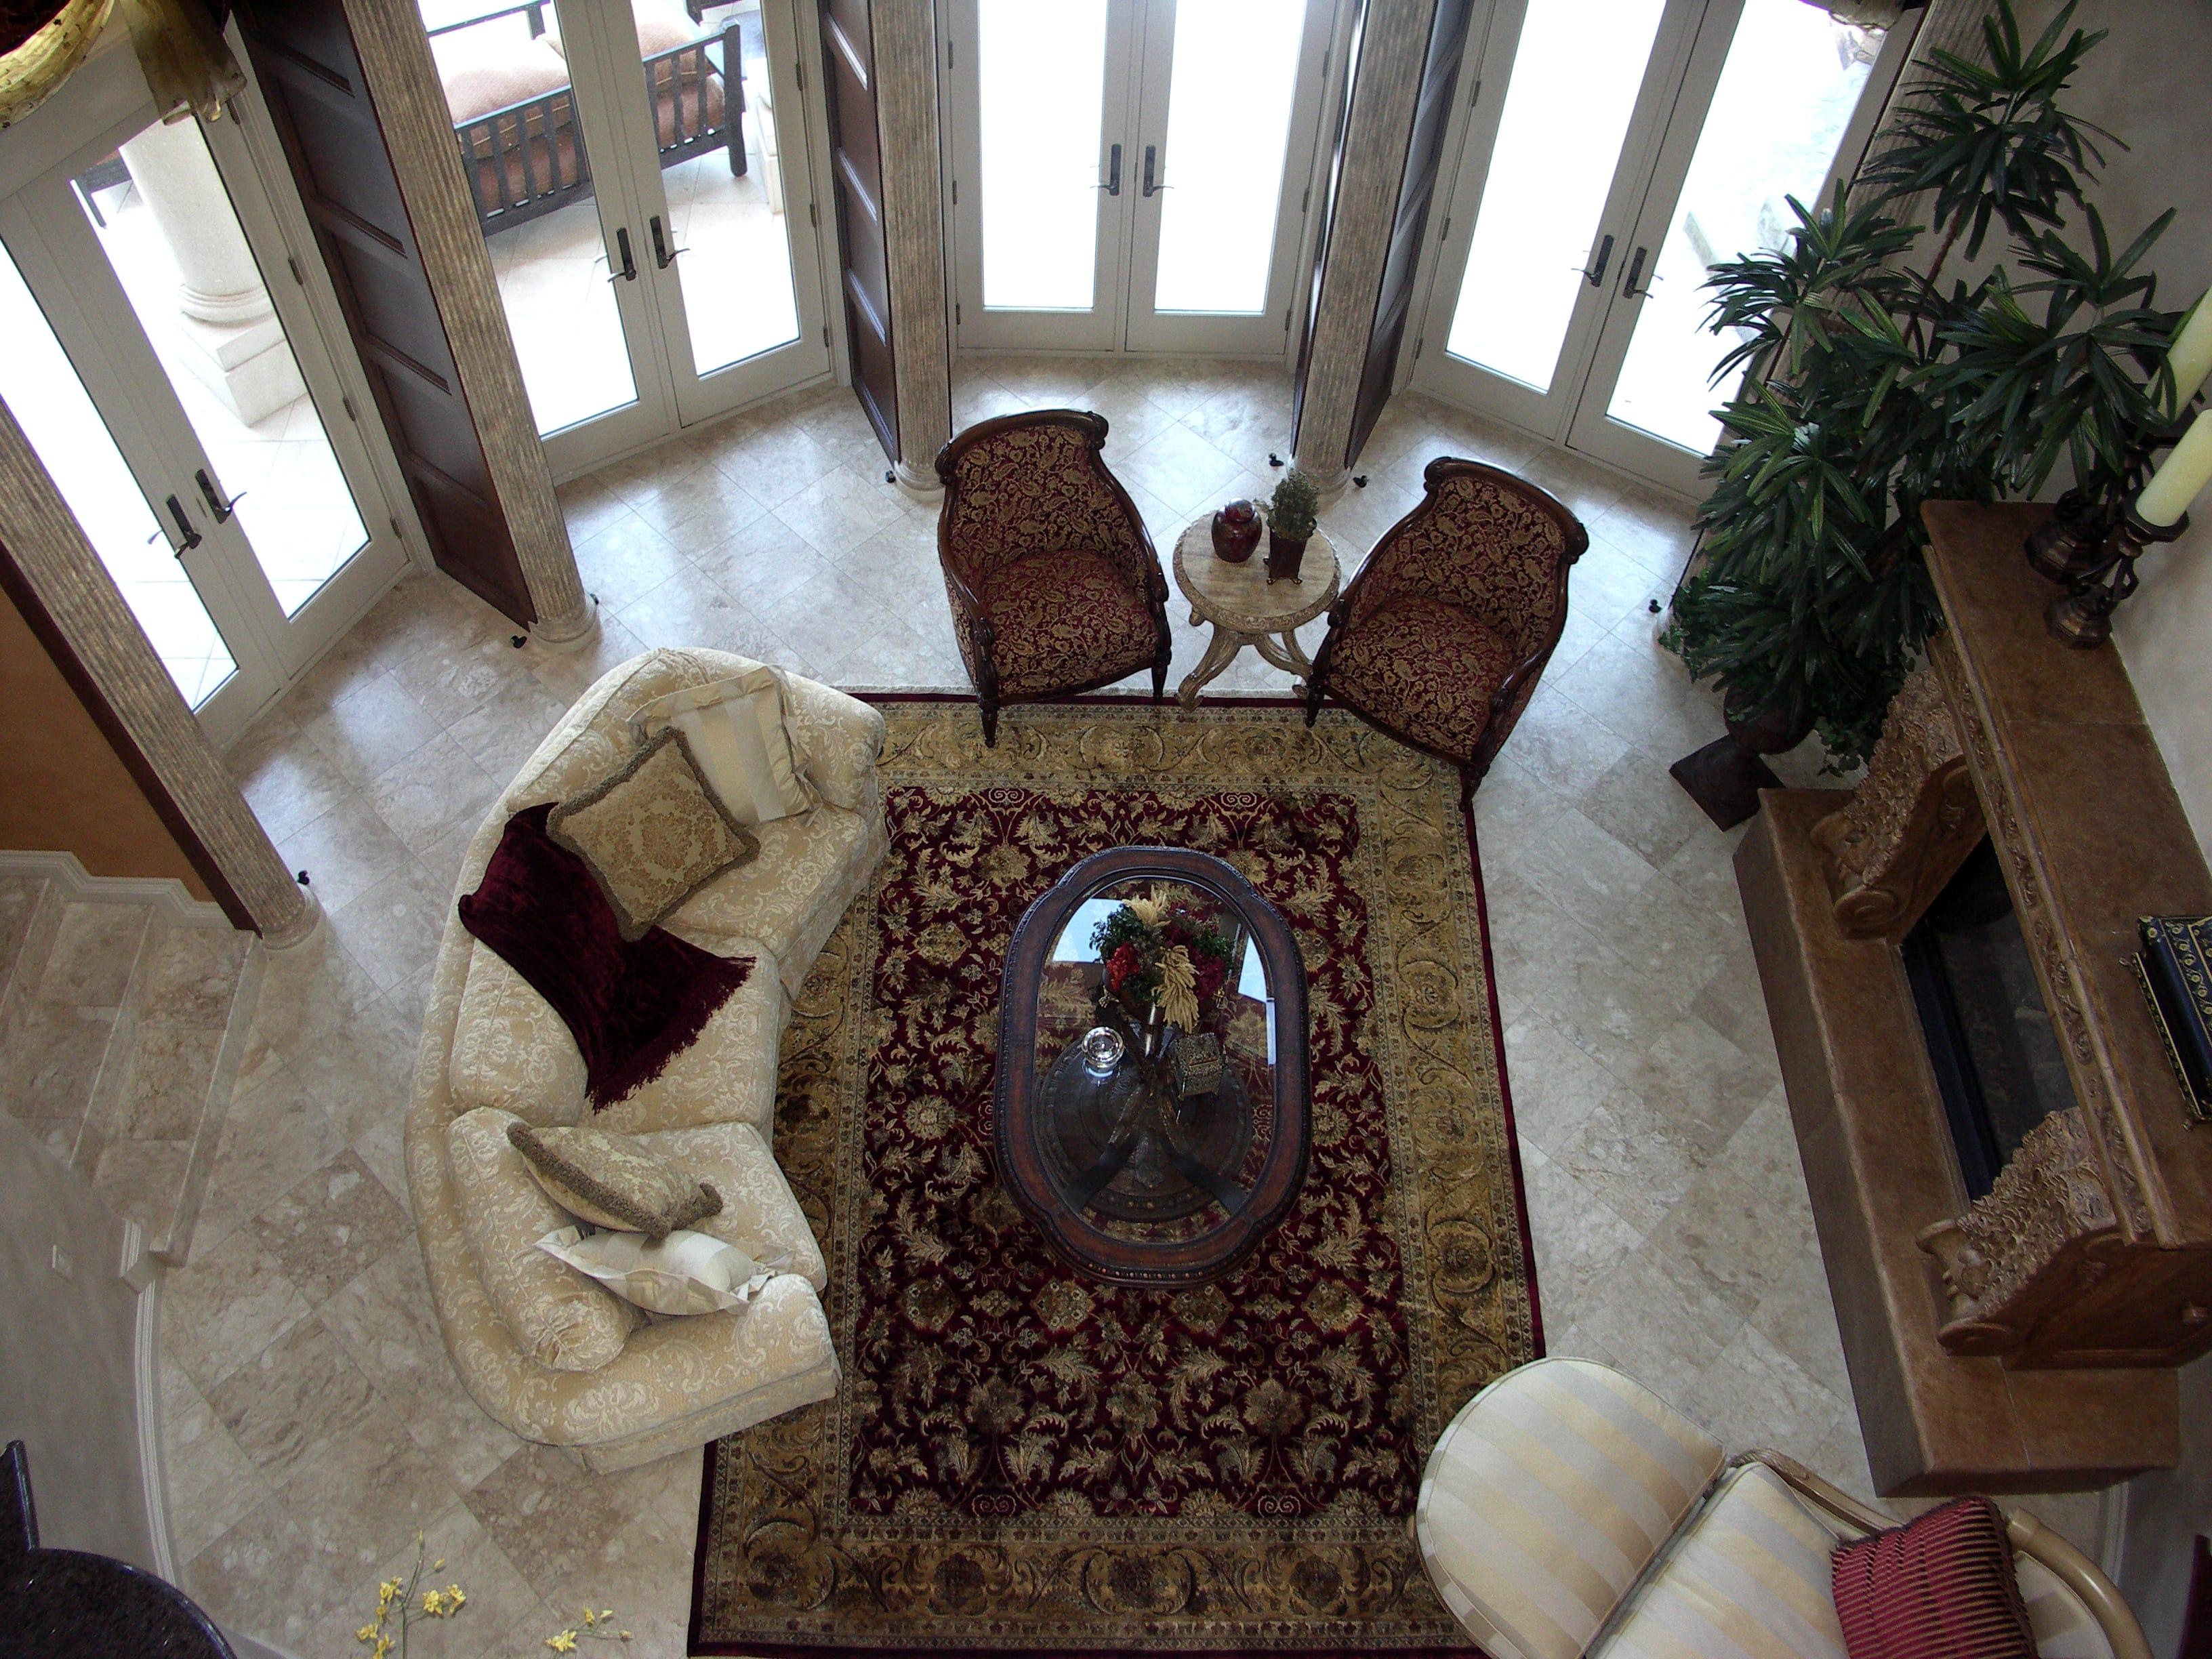 Brathwaite Las Vegas living room (after)